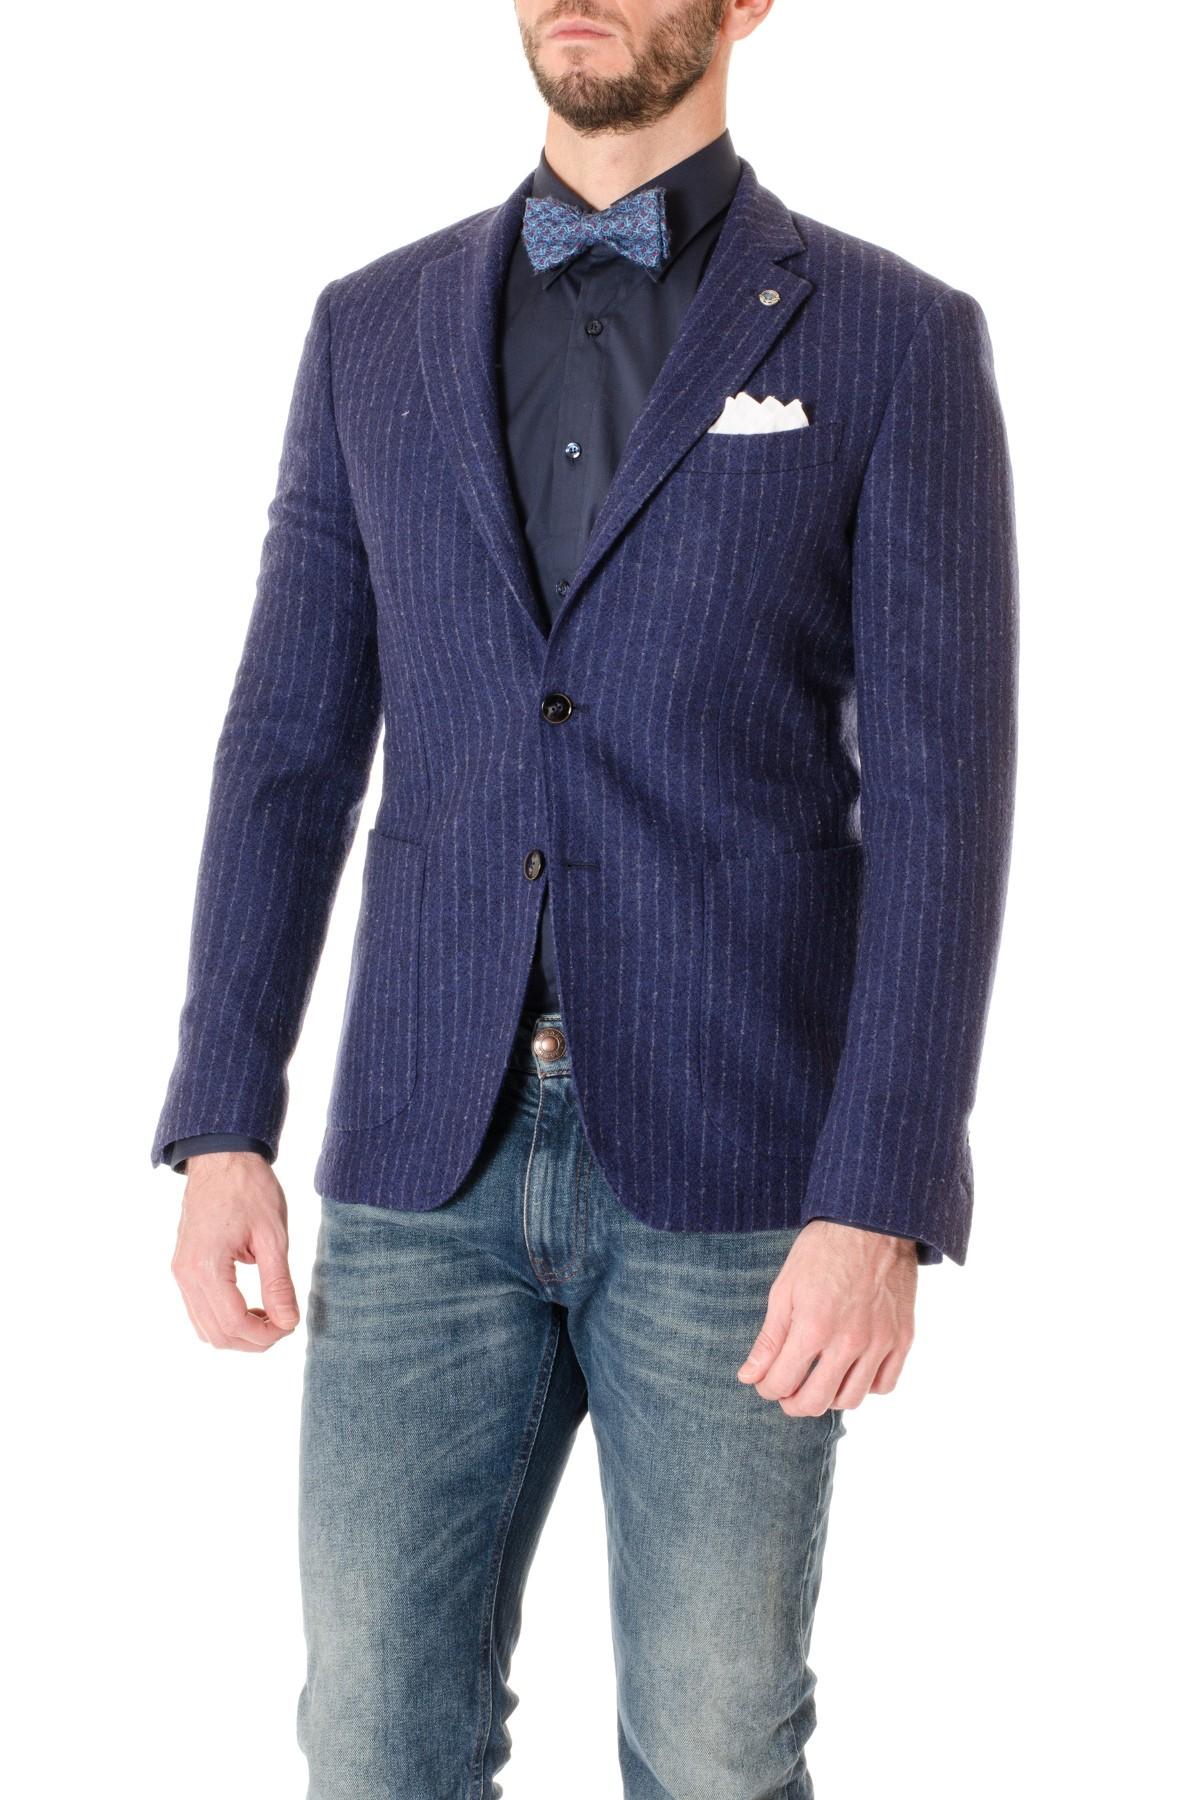 Giacca Matrimonio Uomo : Domenico tagliente giacca blu gessato per uomo a i